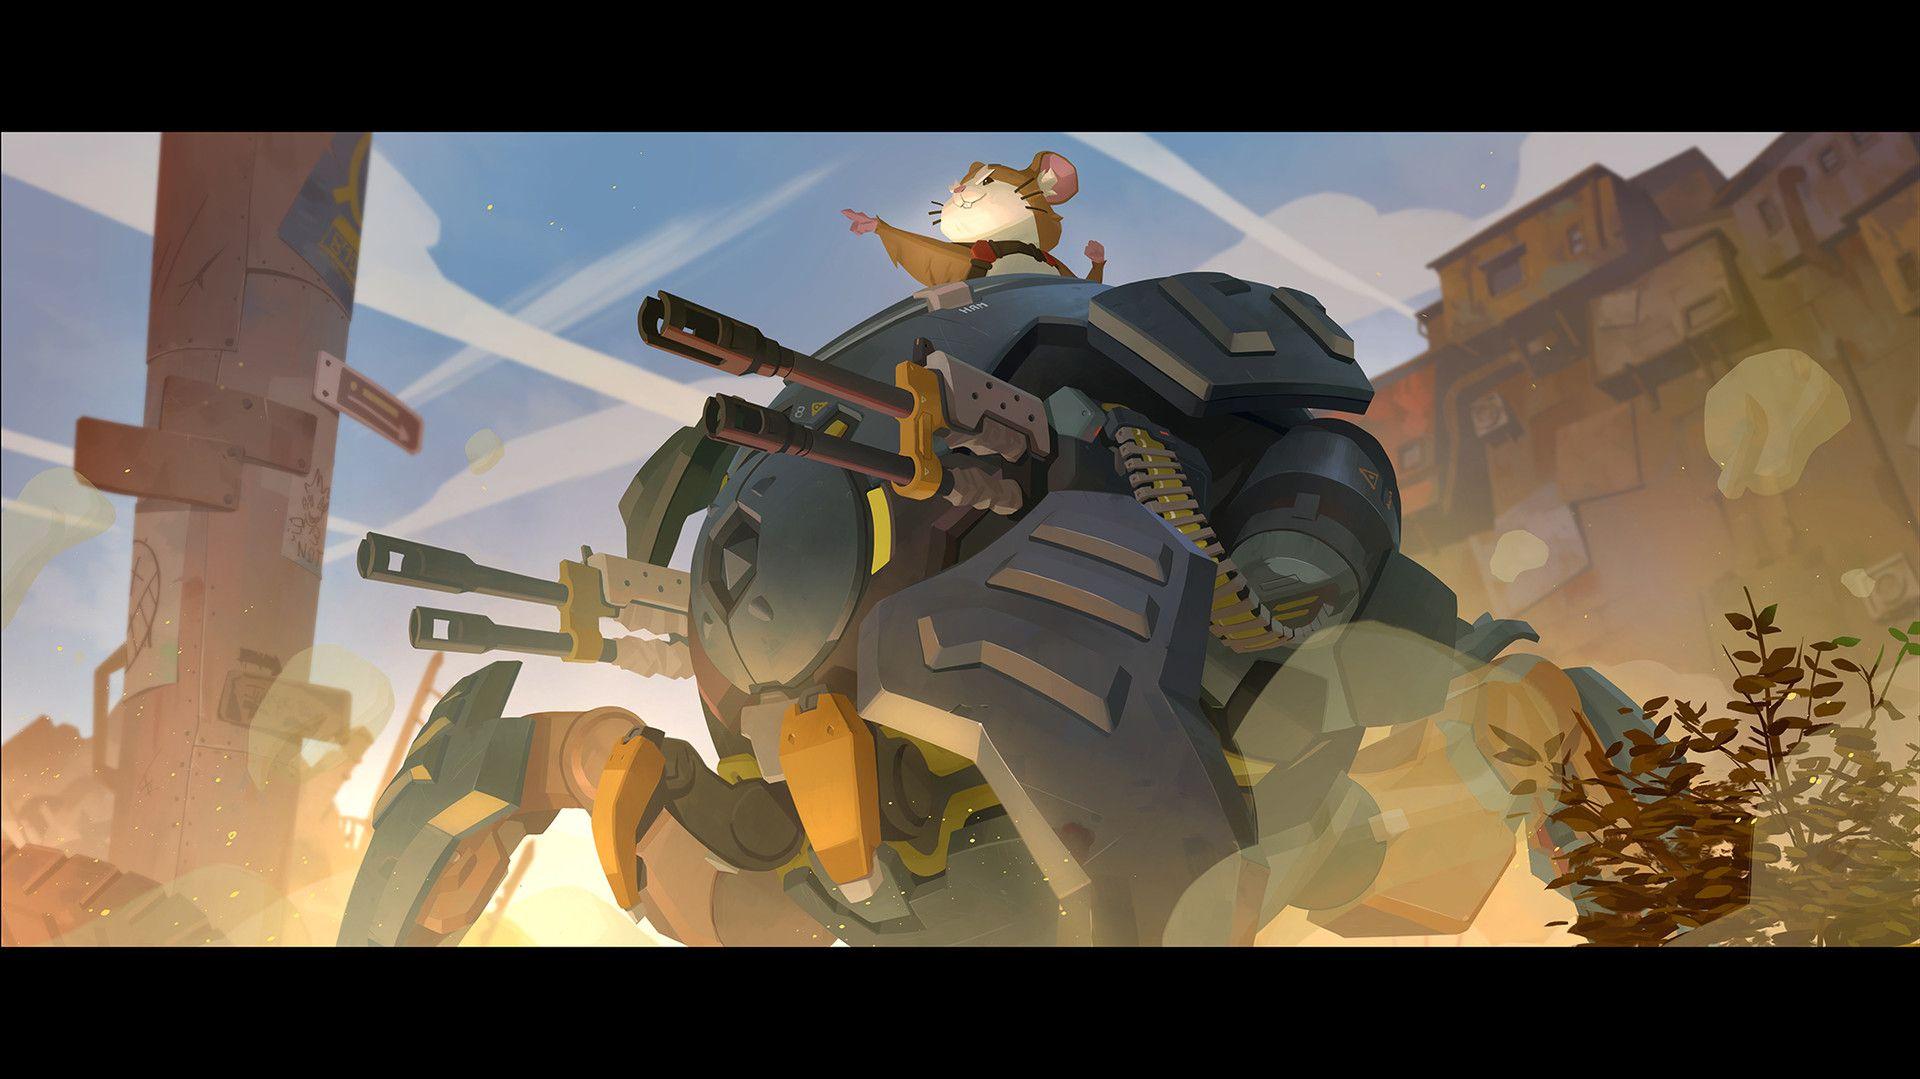 Artstation Wrecking Ball Origin Story Nesskain Hks Overwatch Wallpapers Overwatch Wrecking Ball